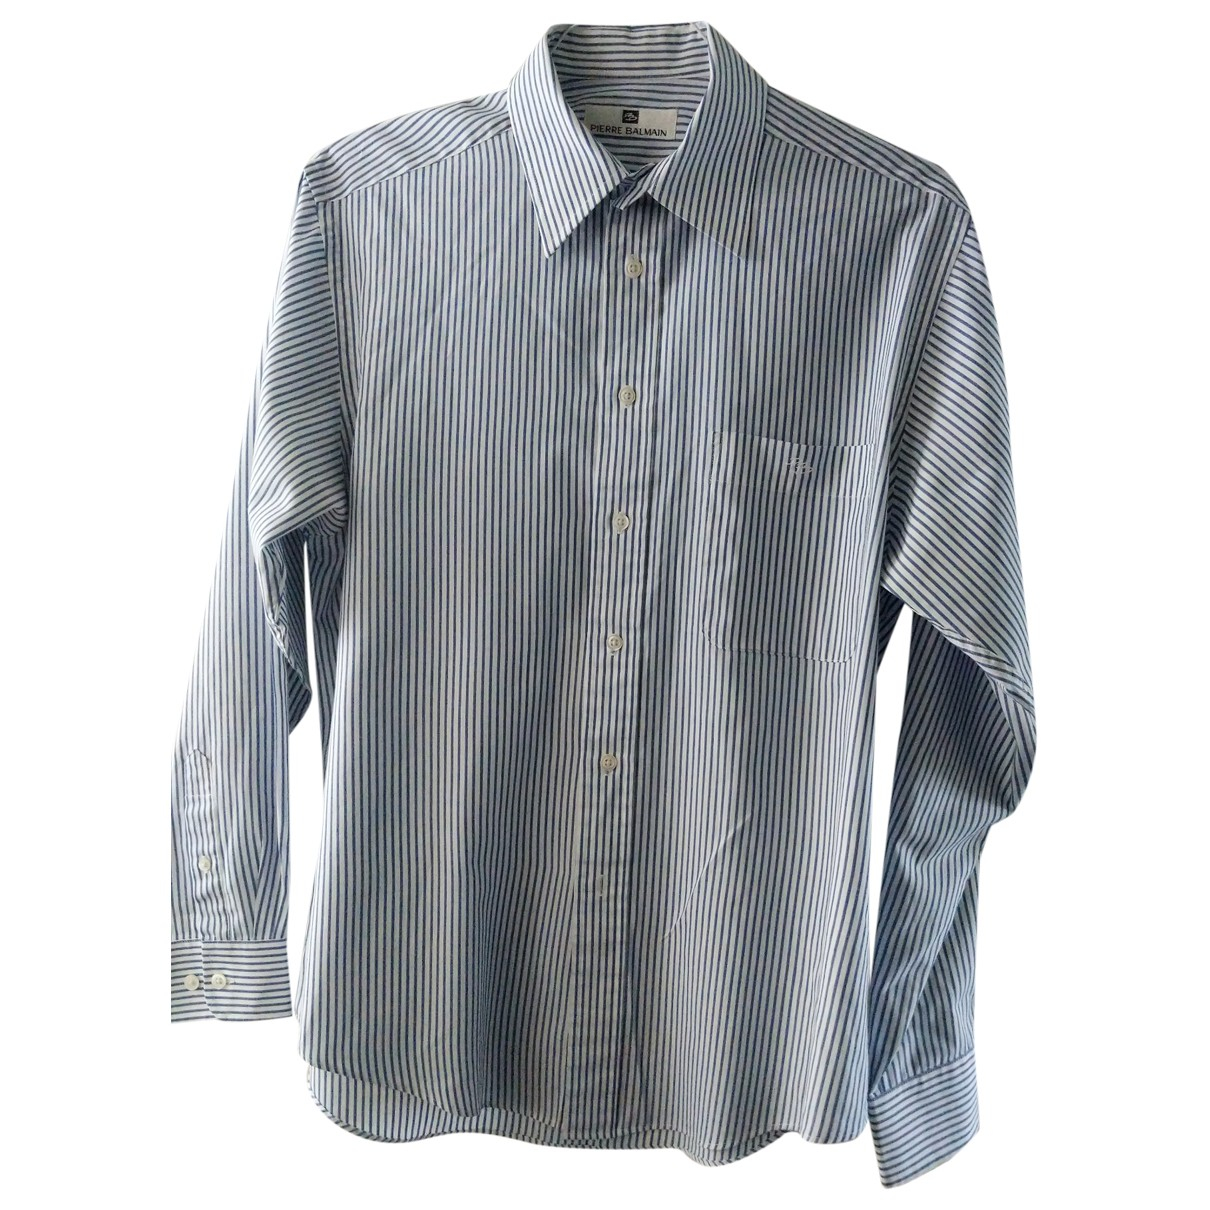 Pierre Balmain \N Blue Cotton Shirts for Men 37 EU (tour de cou / collar)